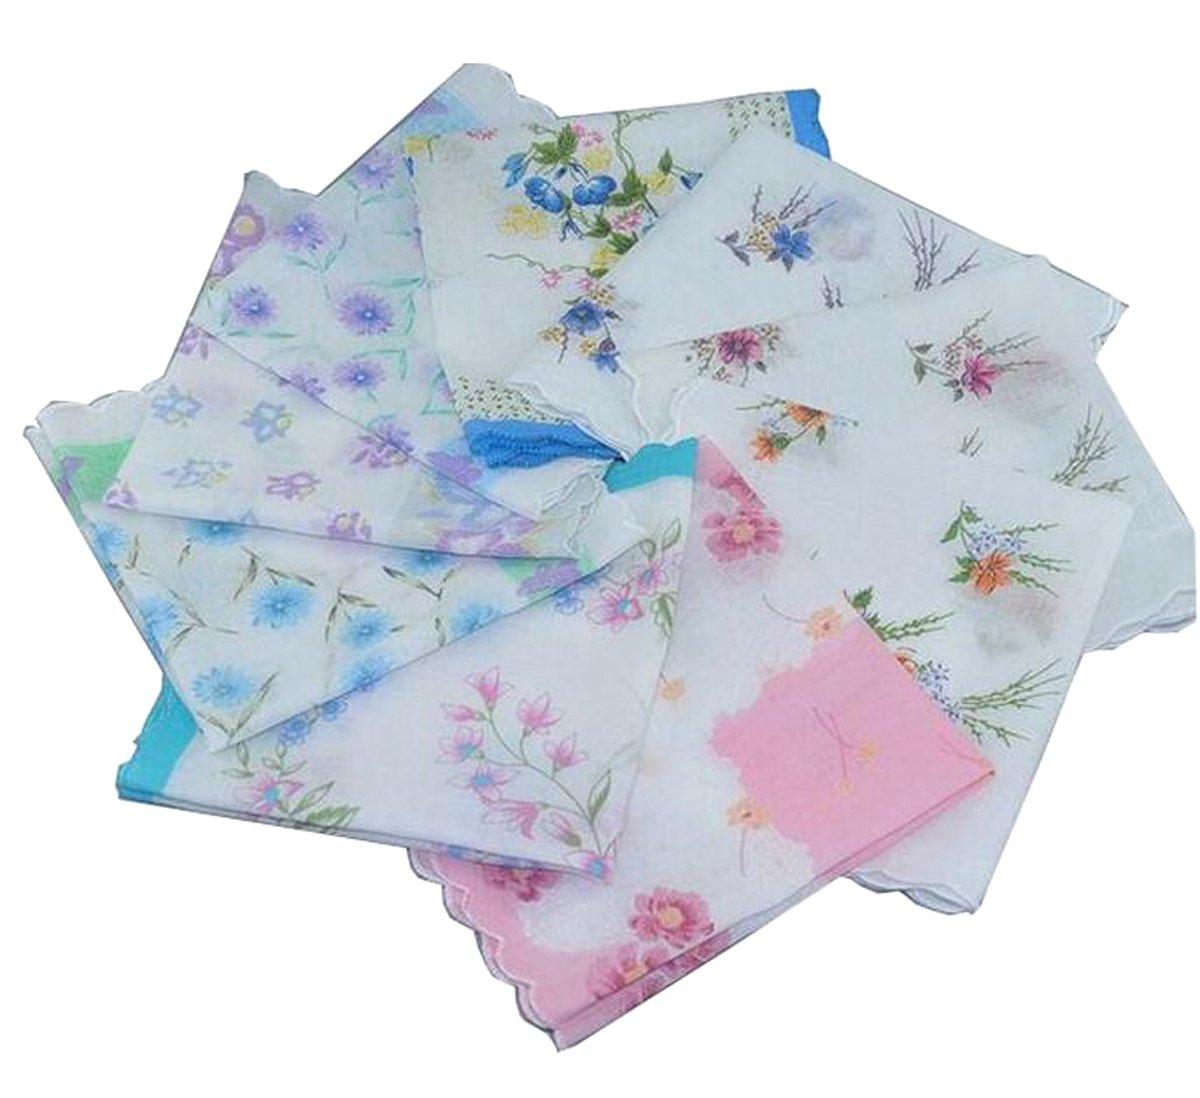 VEBE Womens/Girls Vintage Floral Wedding Party Cotton Handkerchiefs 3